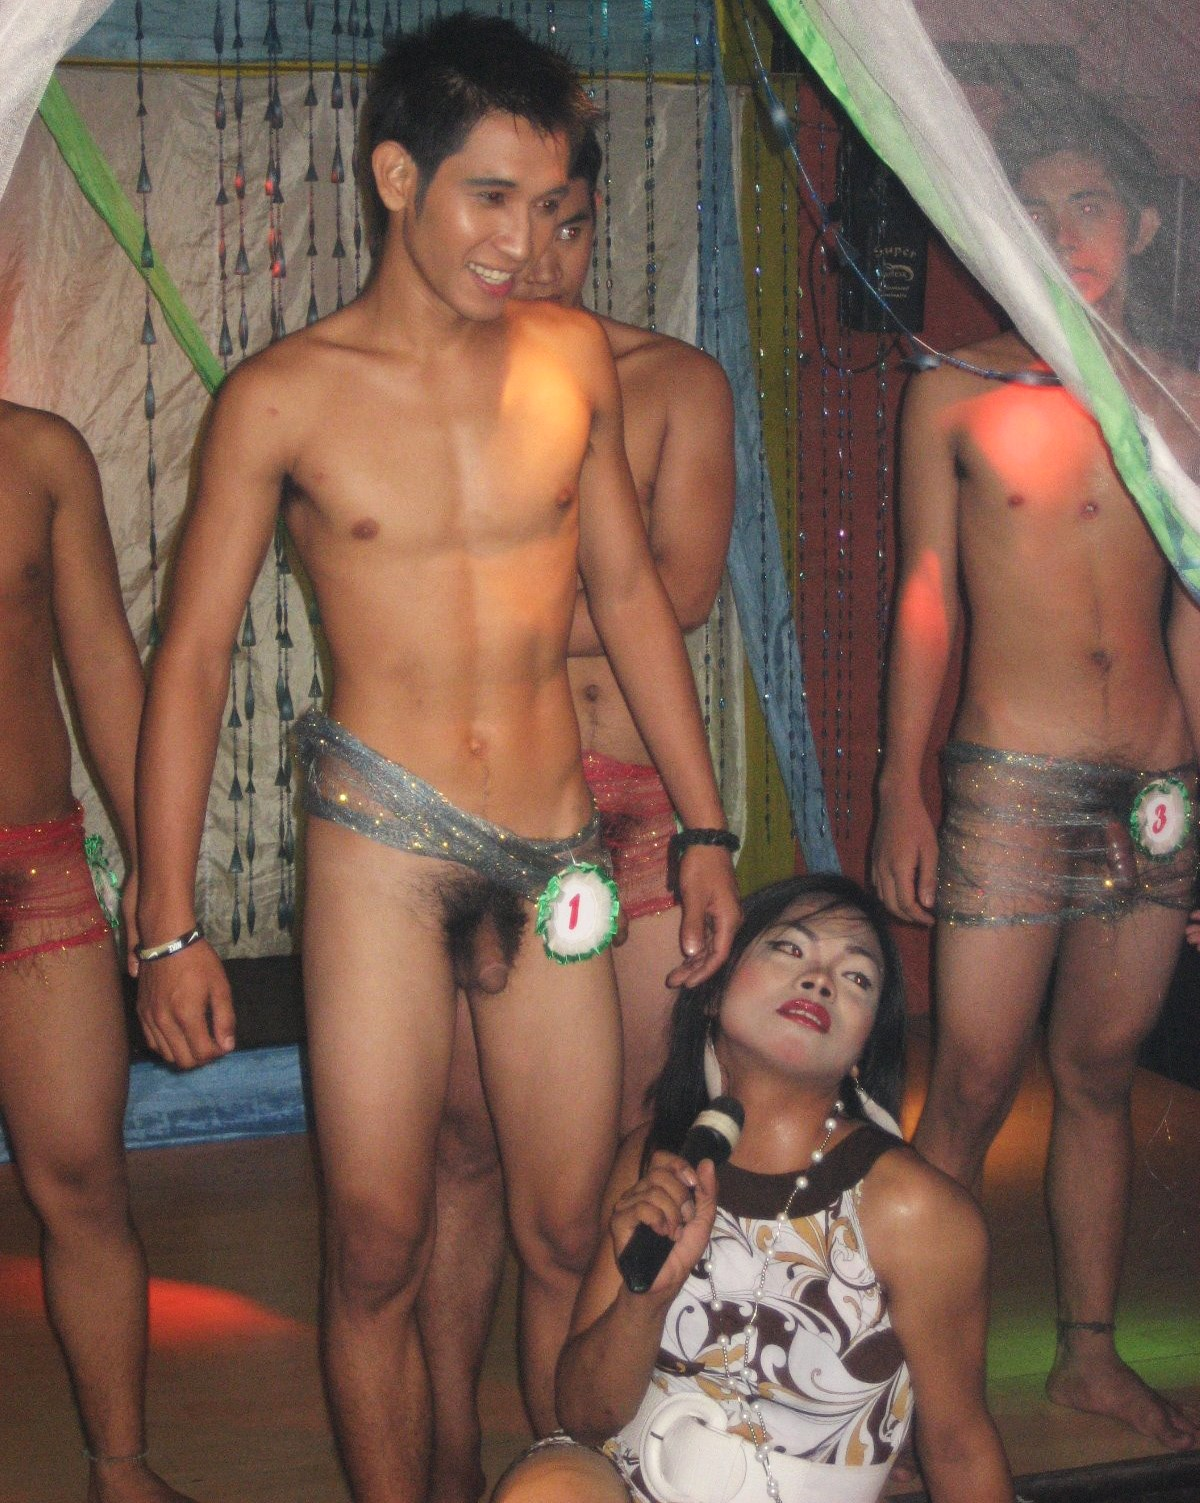 Gay sex movies circumcised men videos tory 7